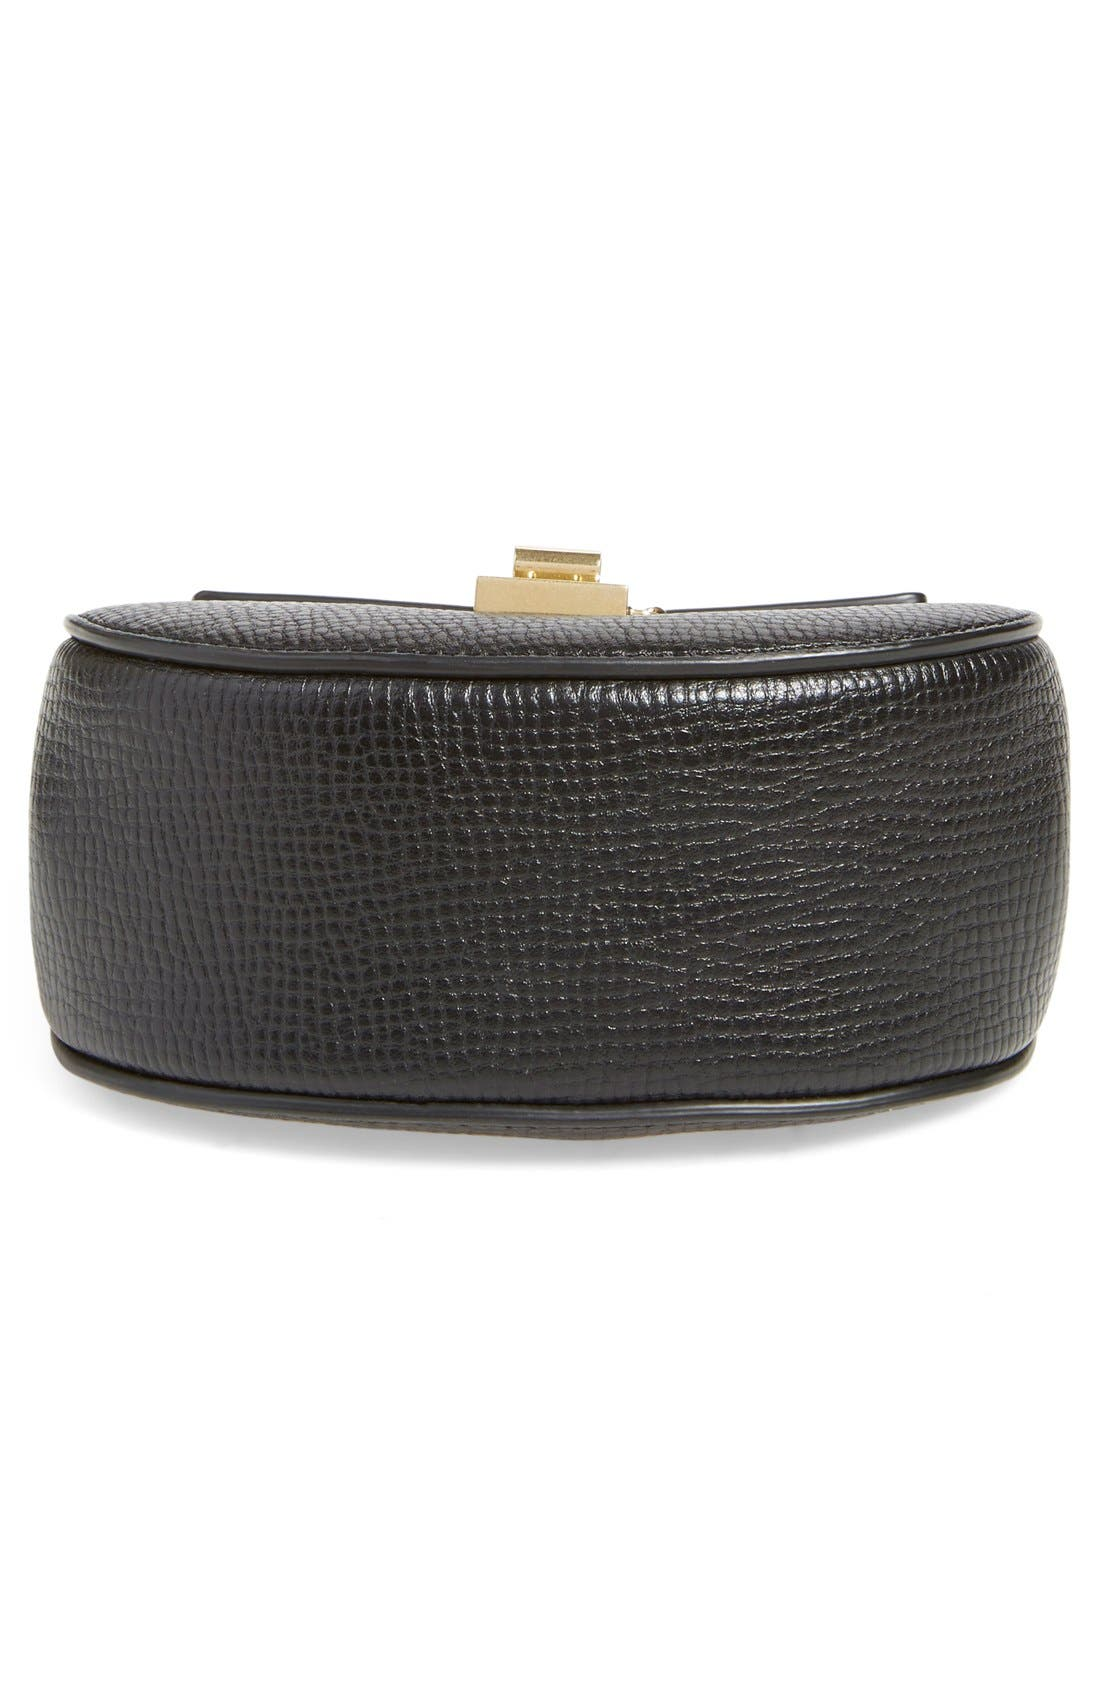 Alternate Image 5  - Chloé 'Nano Drew' Lambskin & Calfskin Leather Shoulder Bag